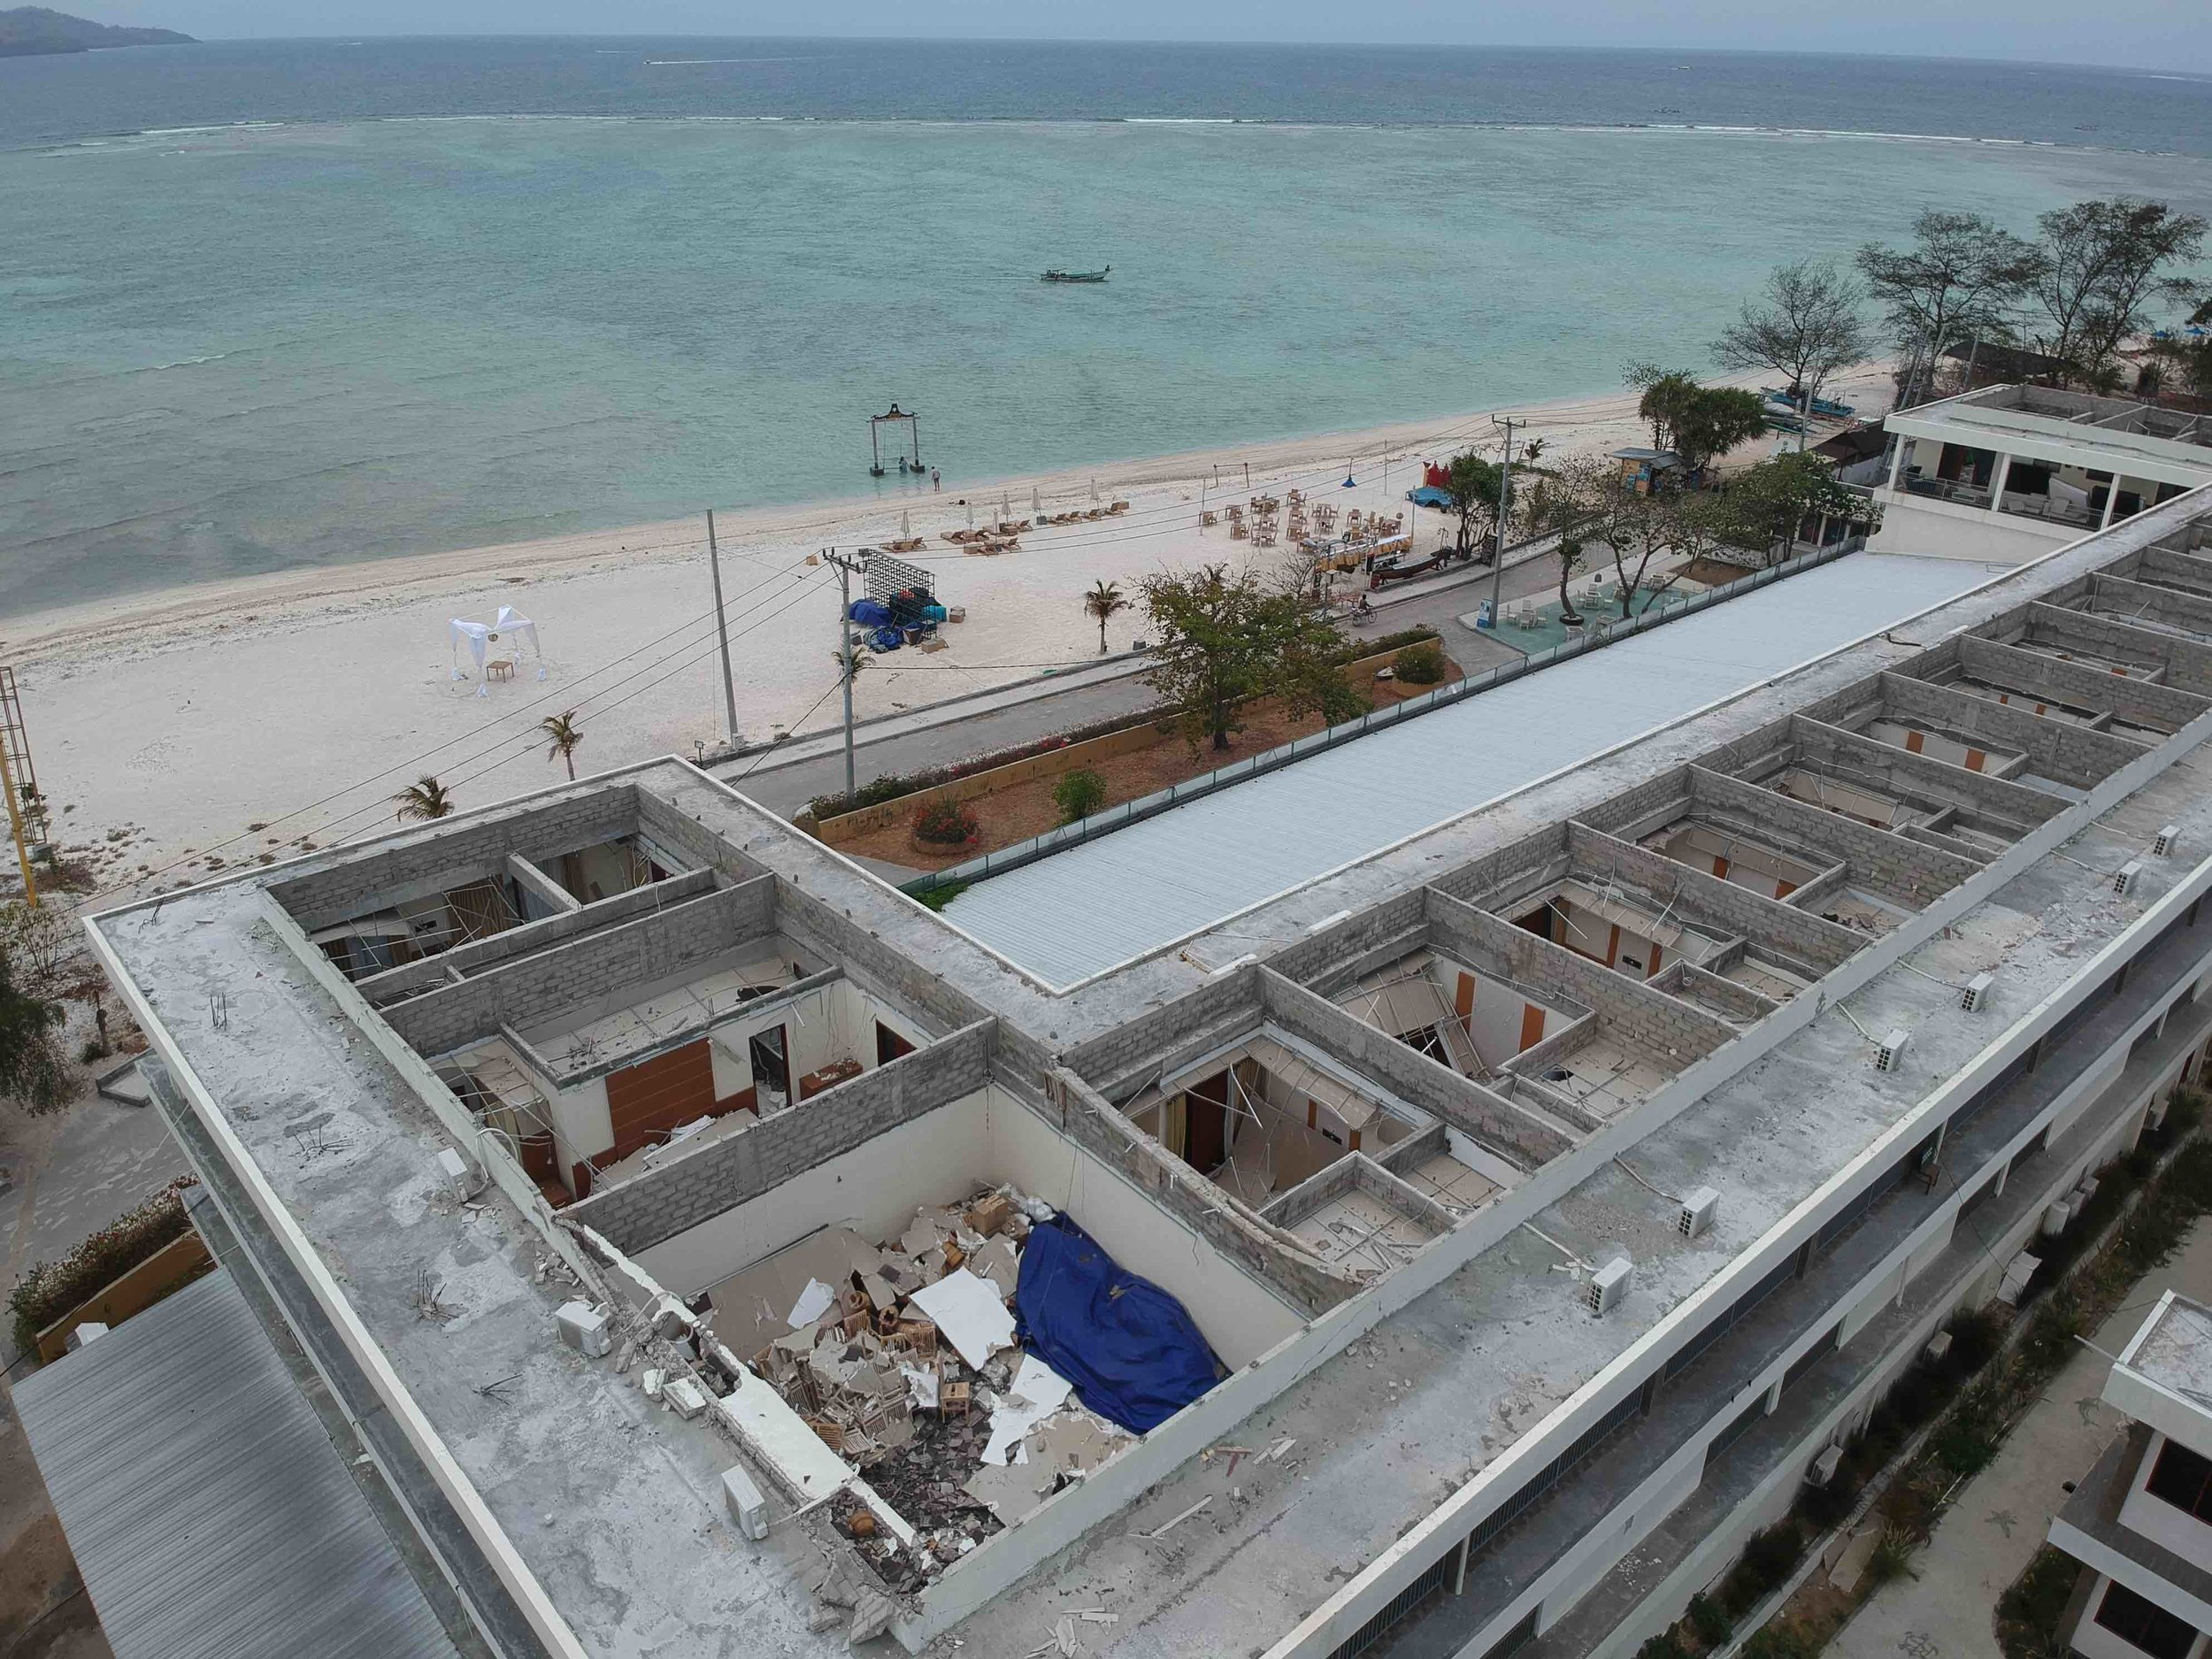 James Buchanan | Ombak Hotel roof completely caved in